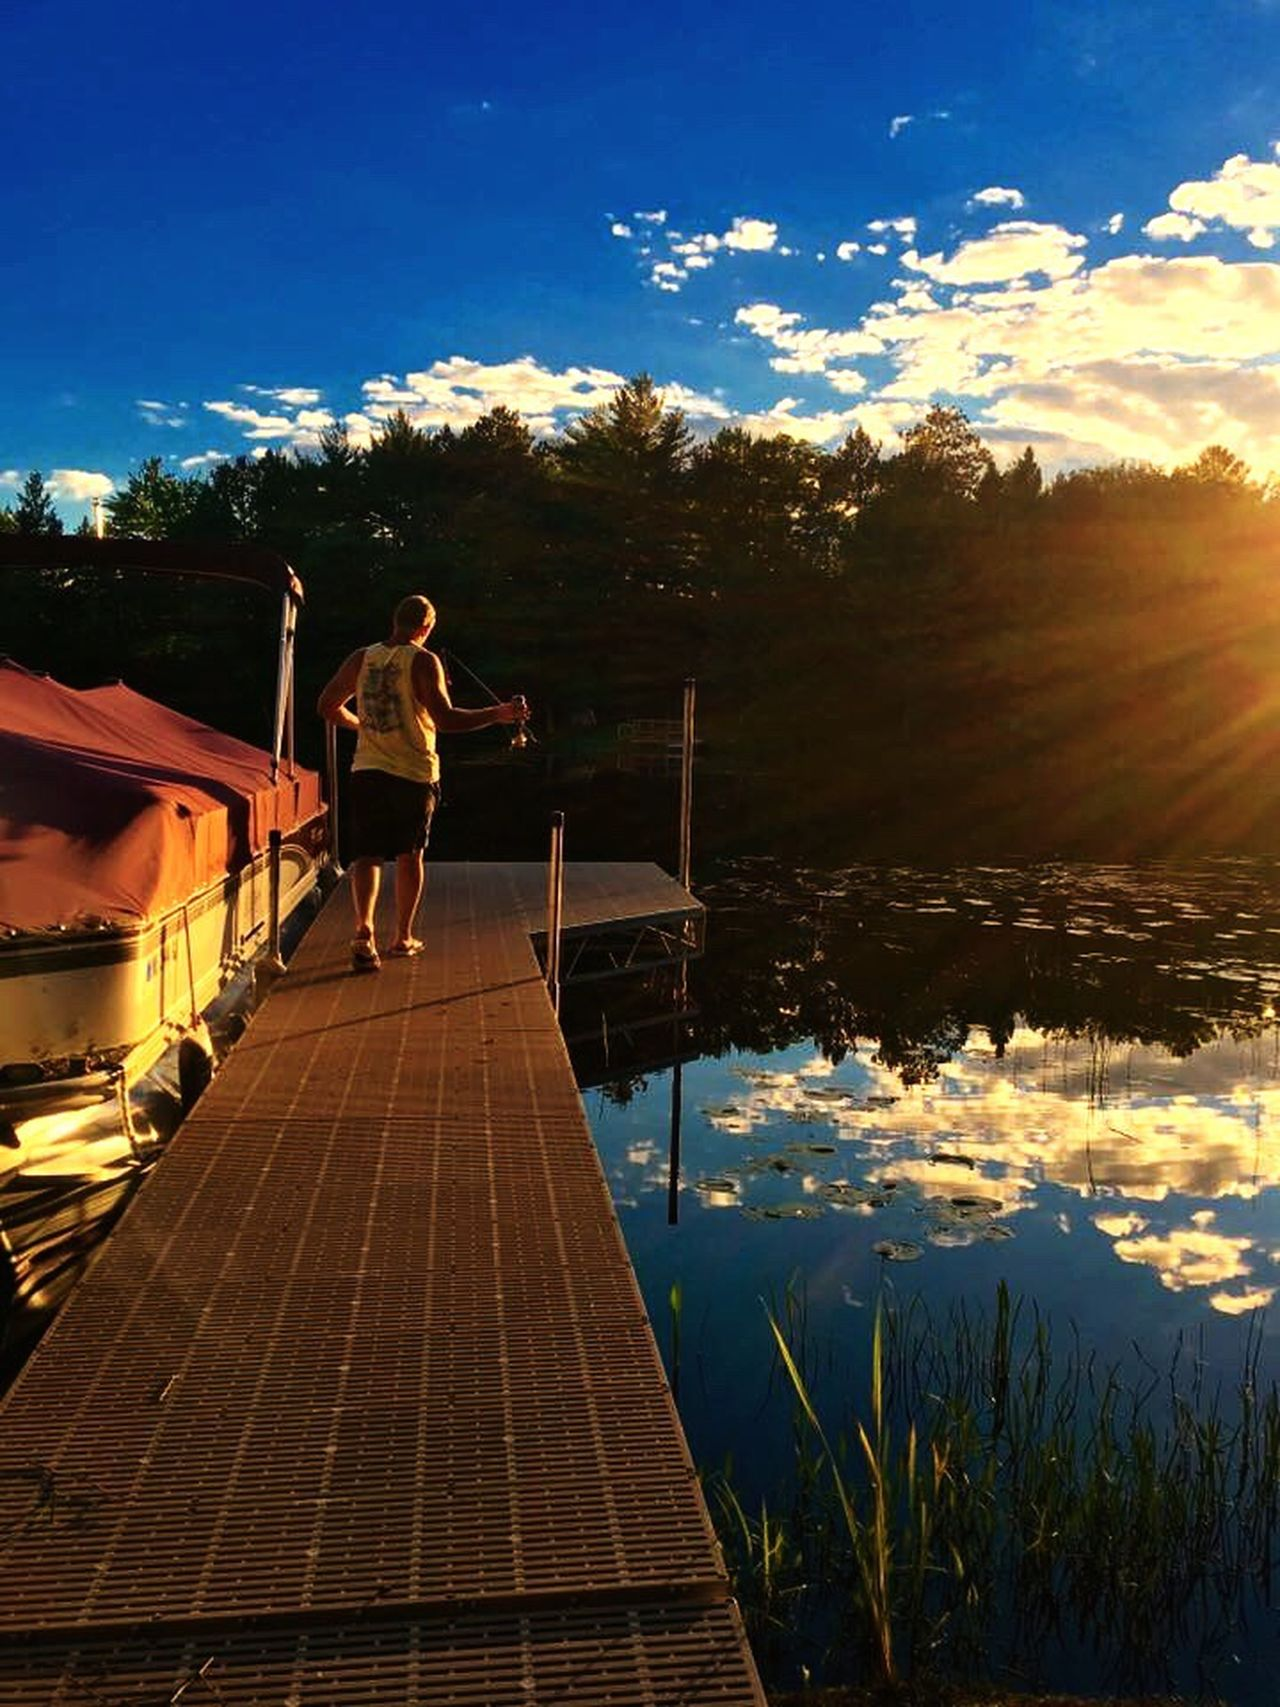 Summer Dock Sunset Fish Fishing Walking Boat Lake River My View